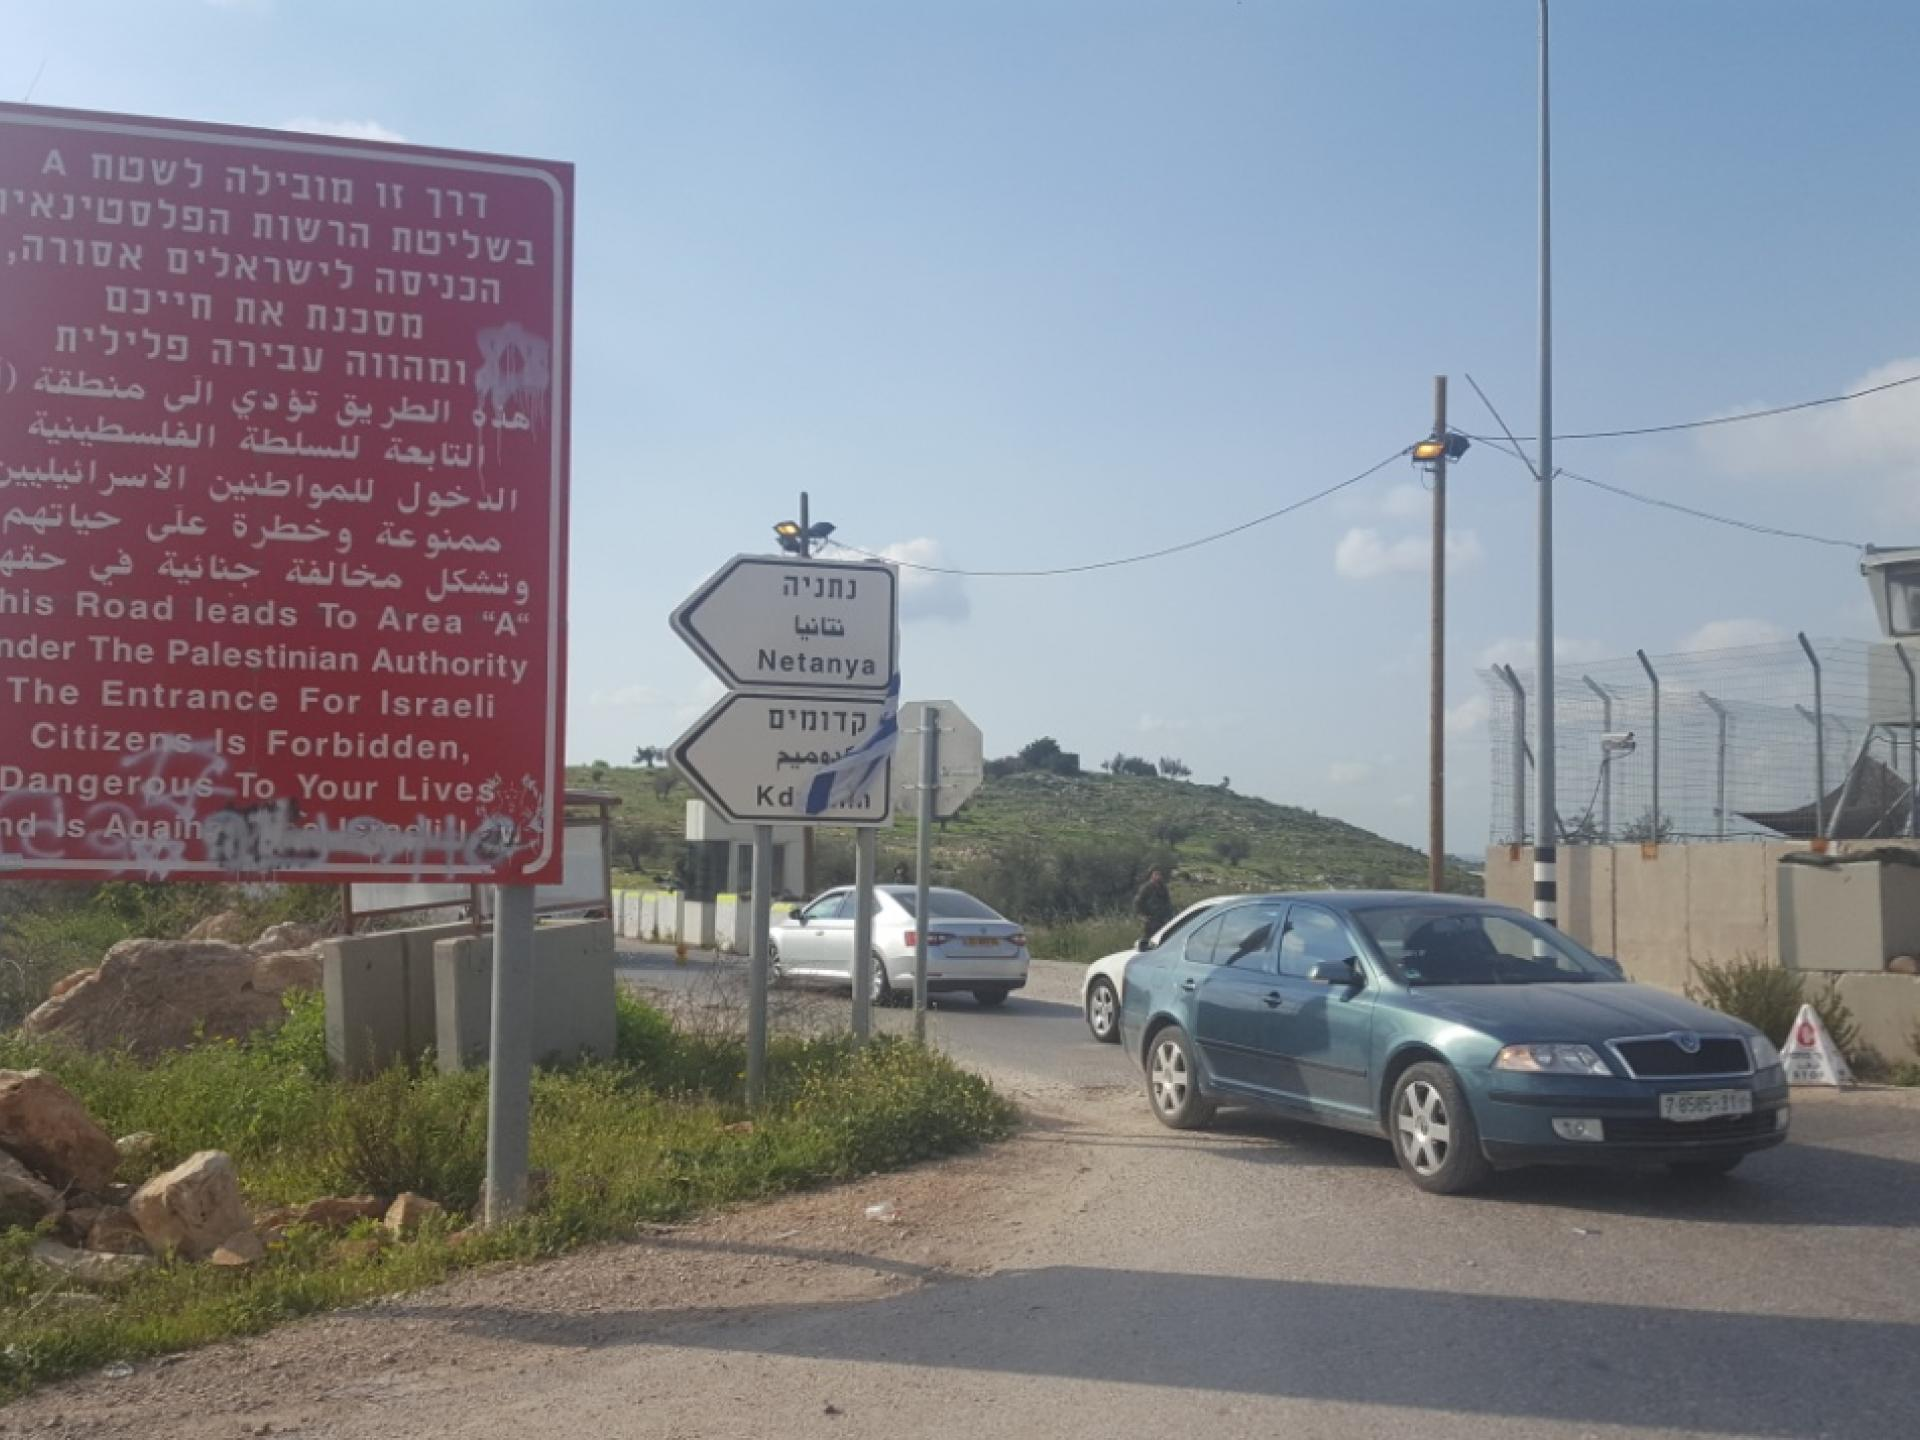 Shufa checkpoint